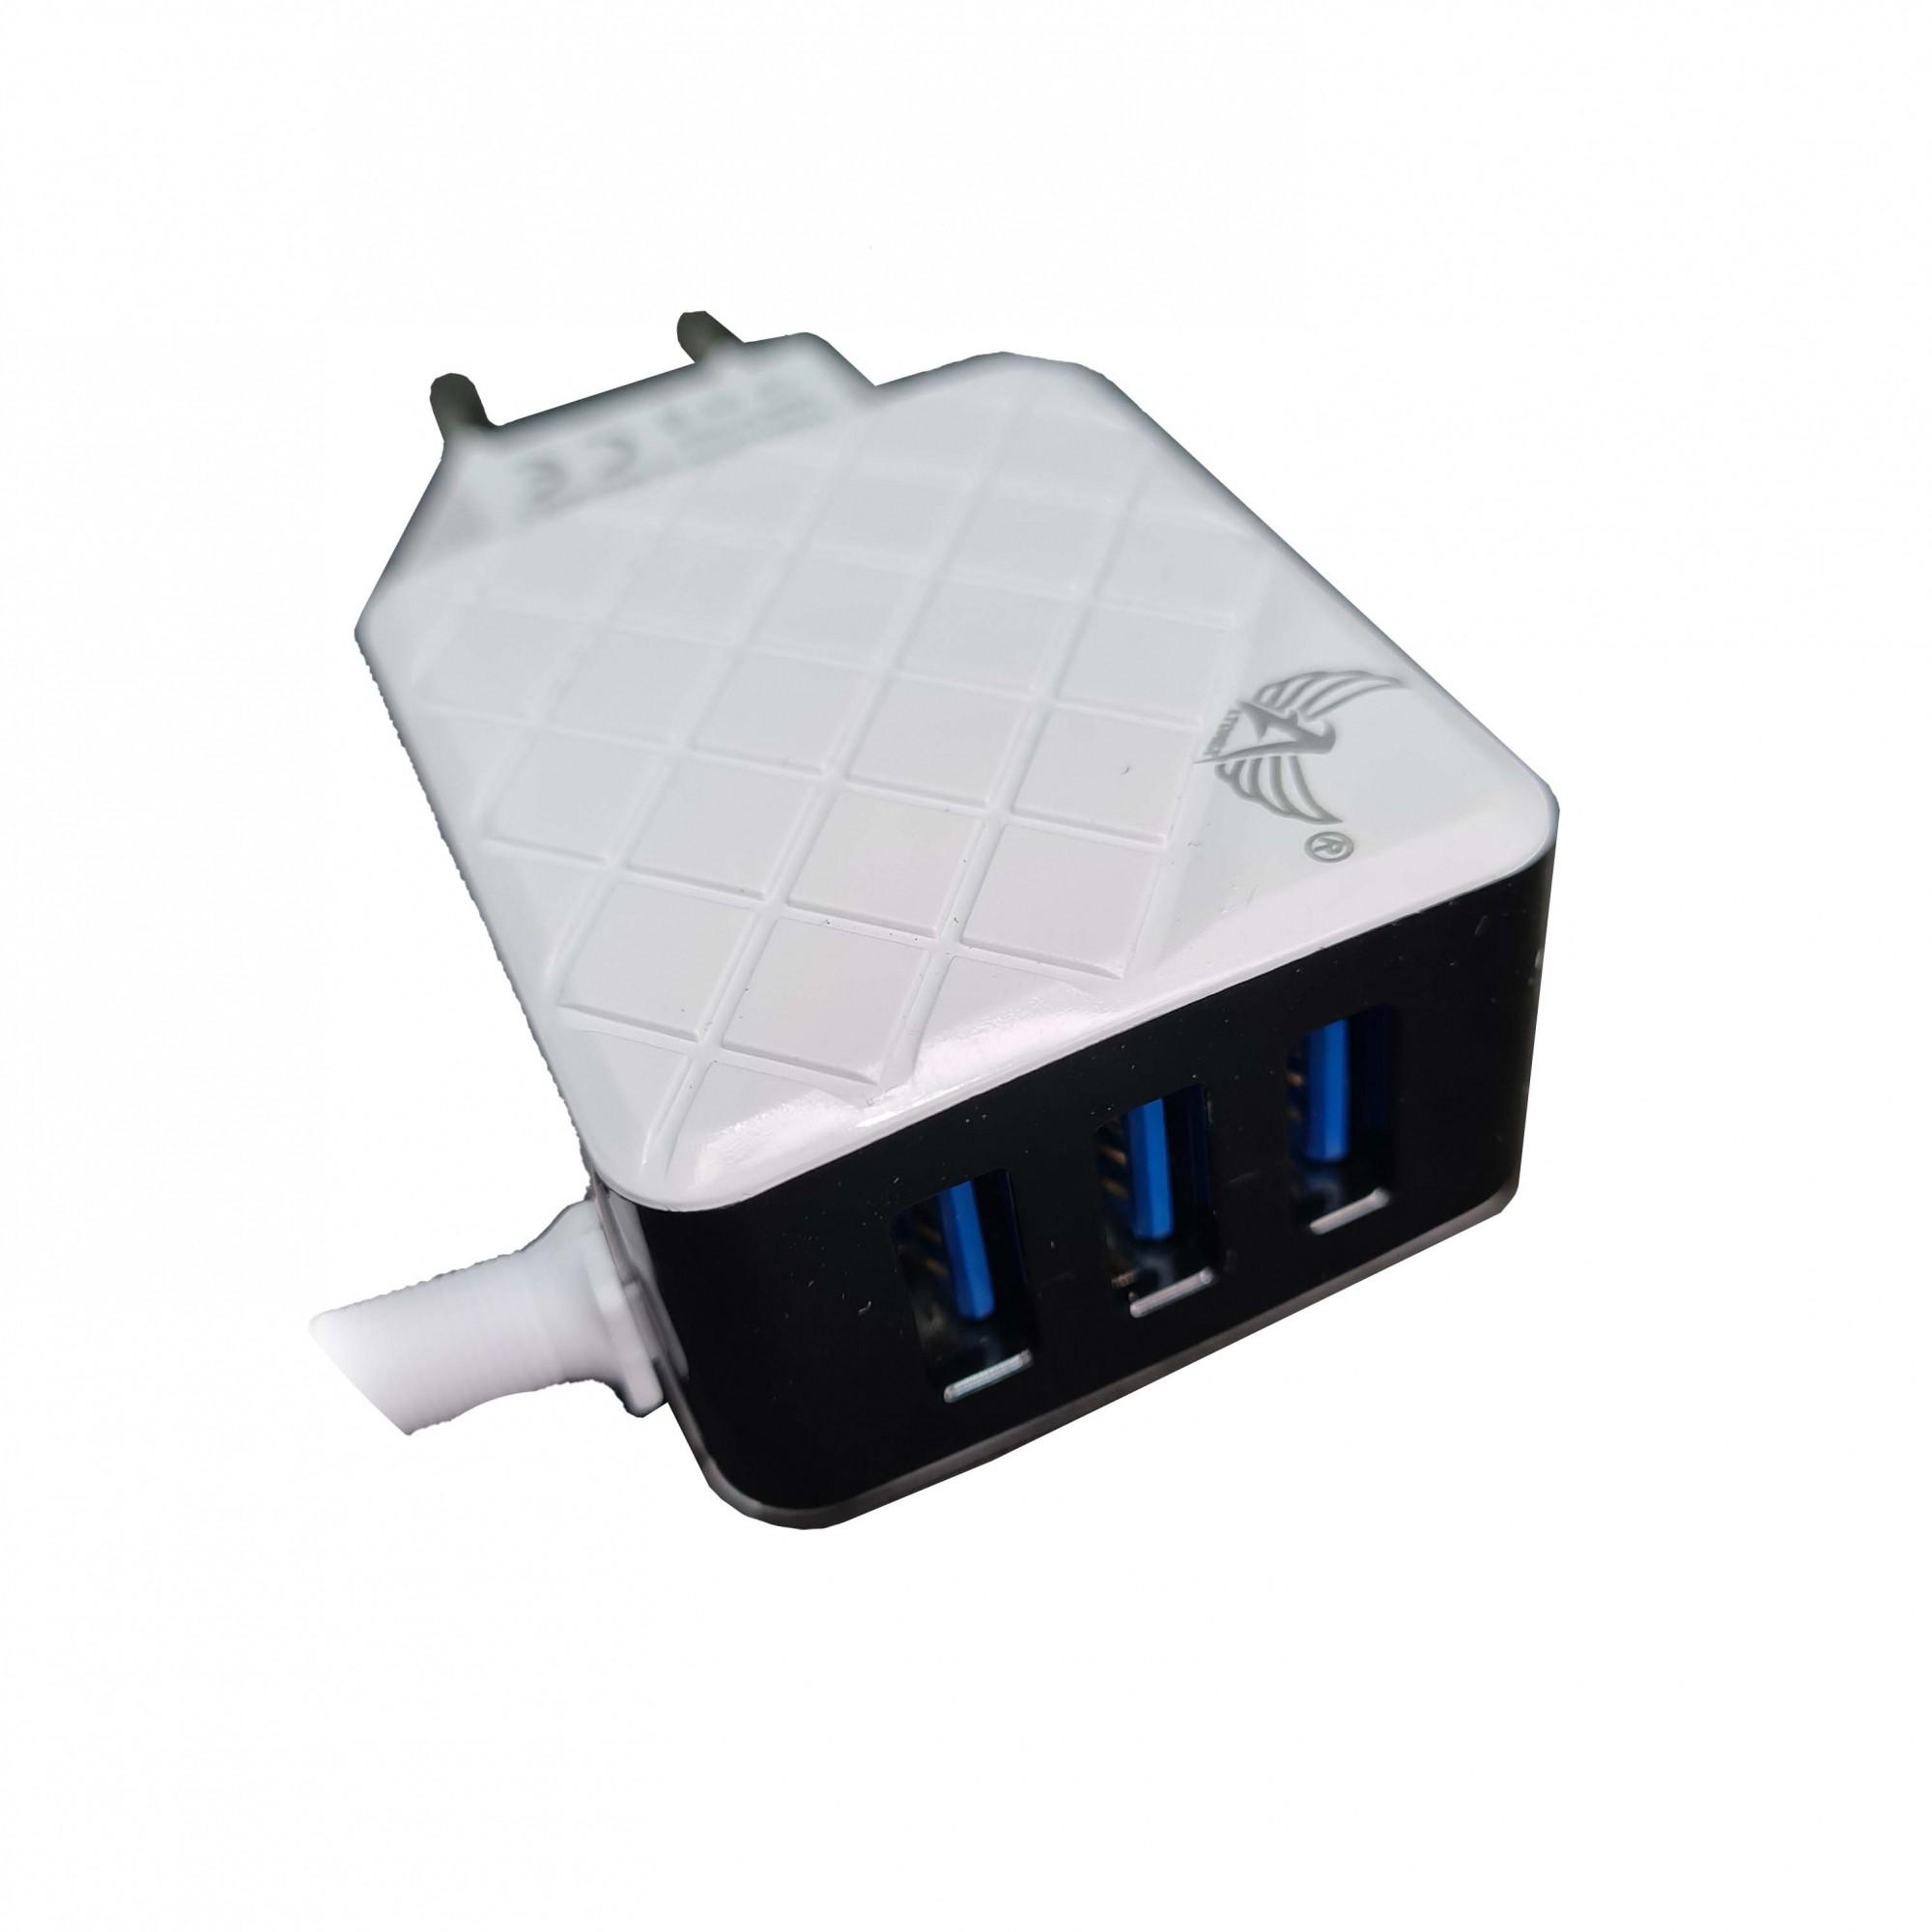 Carregador Celular de parede Iphone 5.8A Rápido Bivolt